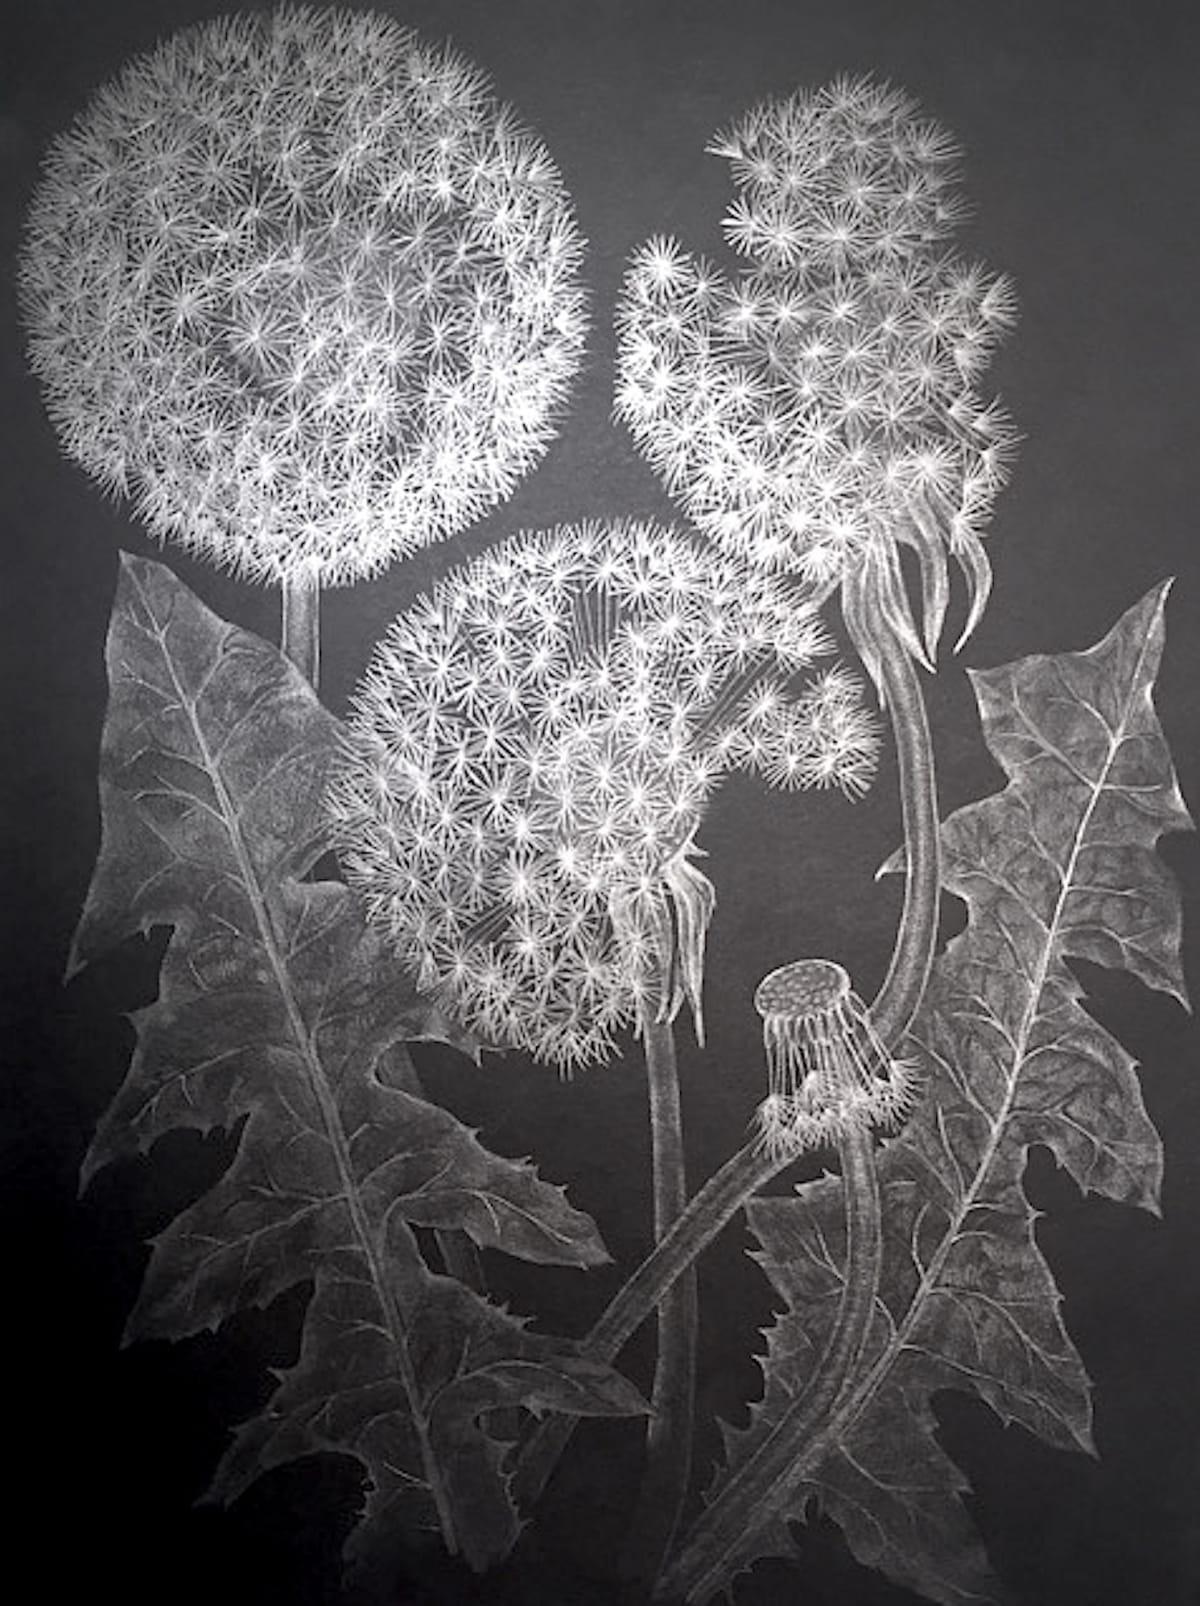 Shouting Flower: Margot Glass